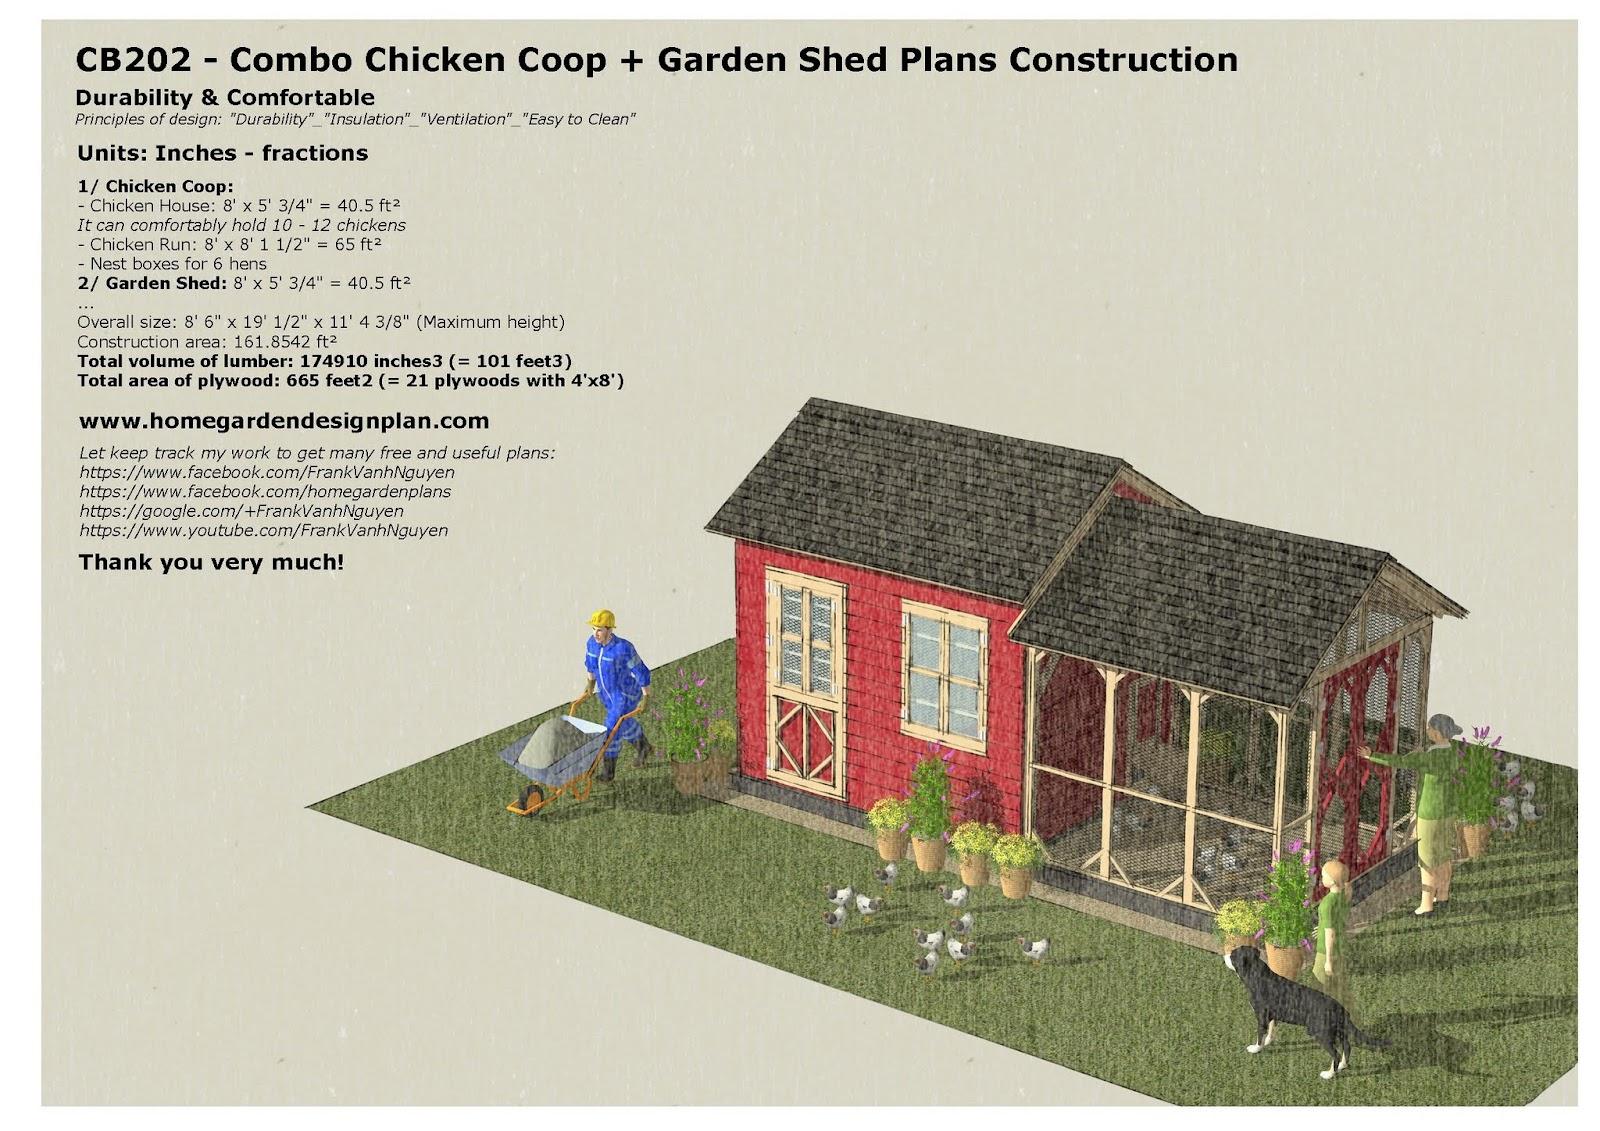 Garden Sheds 8 X 5 home garden plans: cb202 _ combo chicken coop + garden shed plans